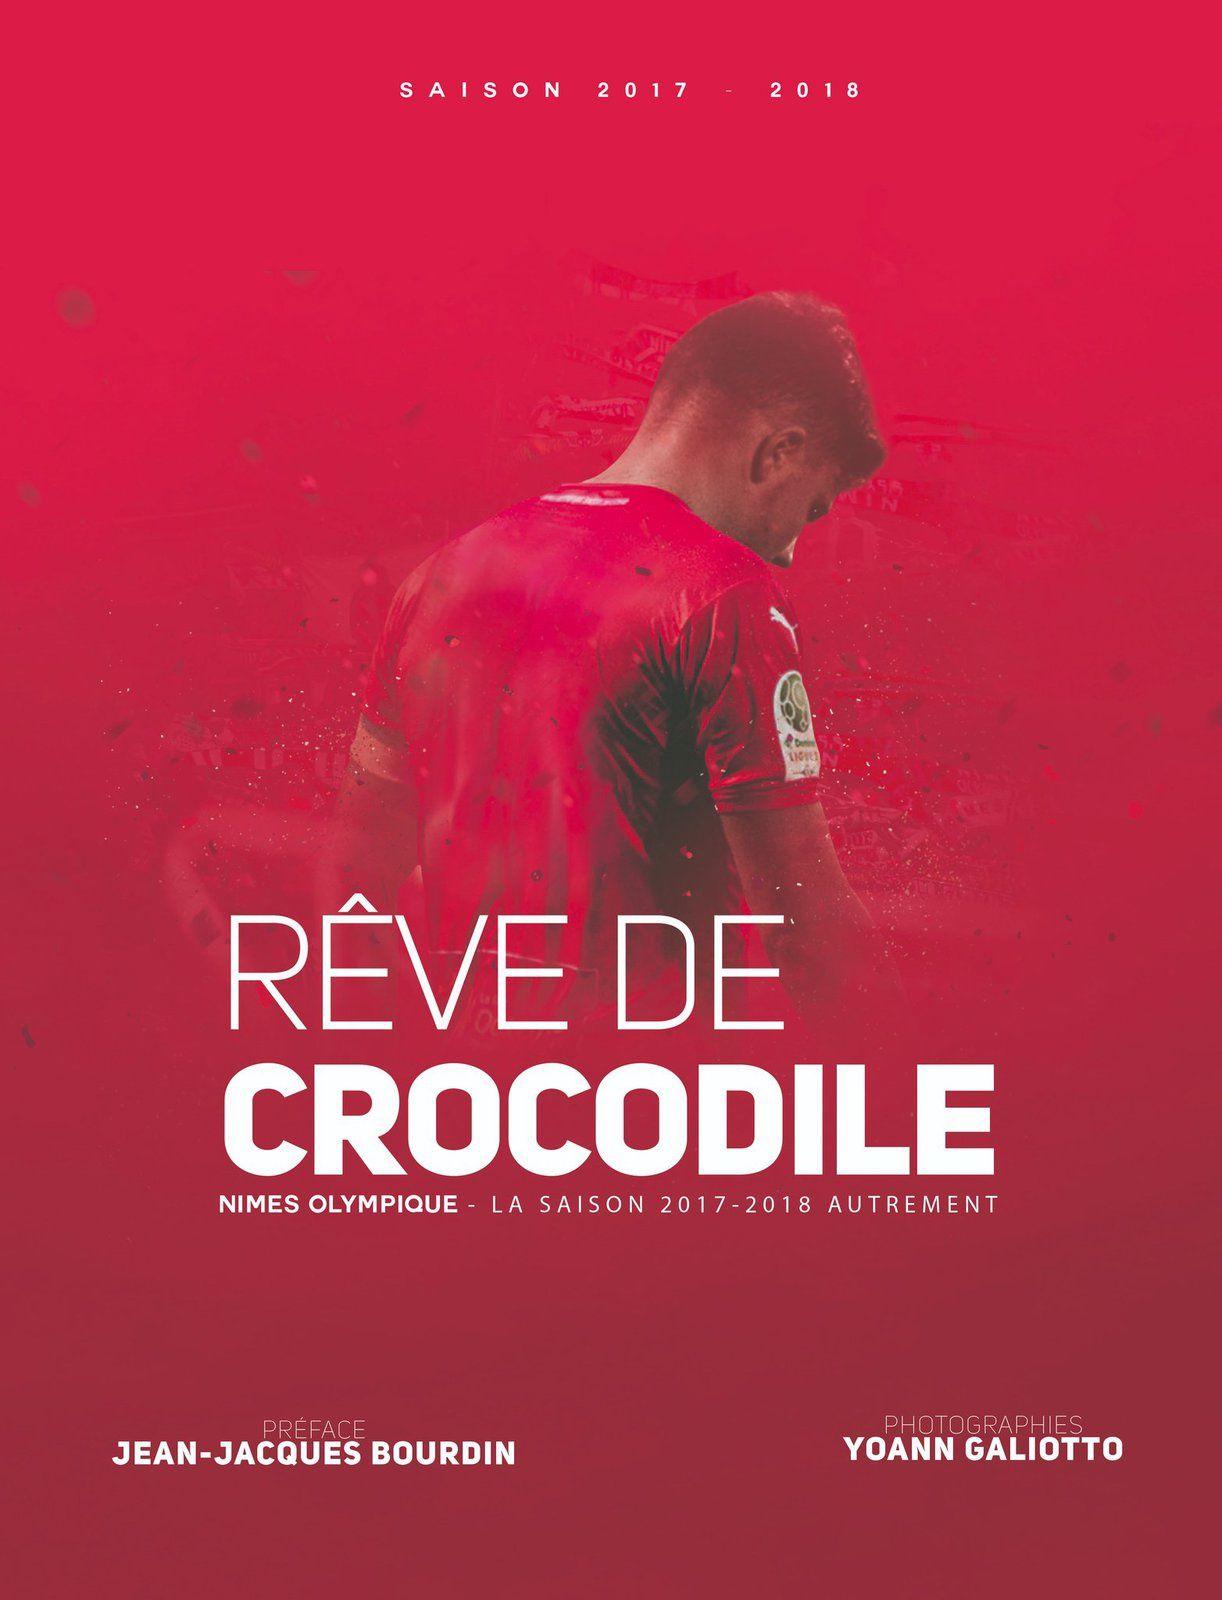 [REVUE LIVRE SPORT] REVE DE CROCODILE de Yoann GALIOTTO